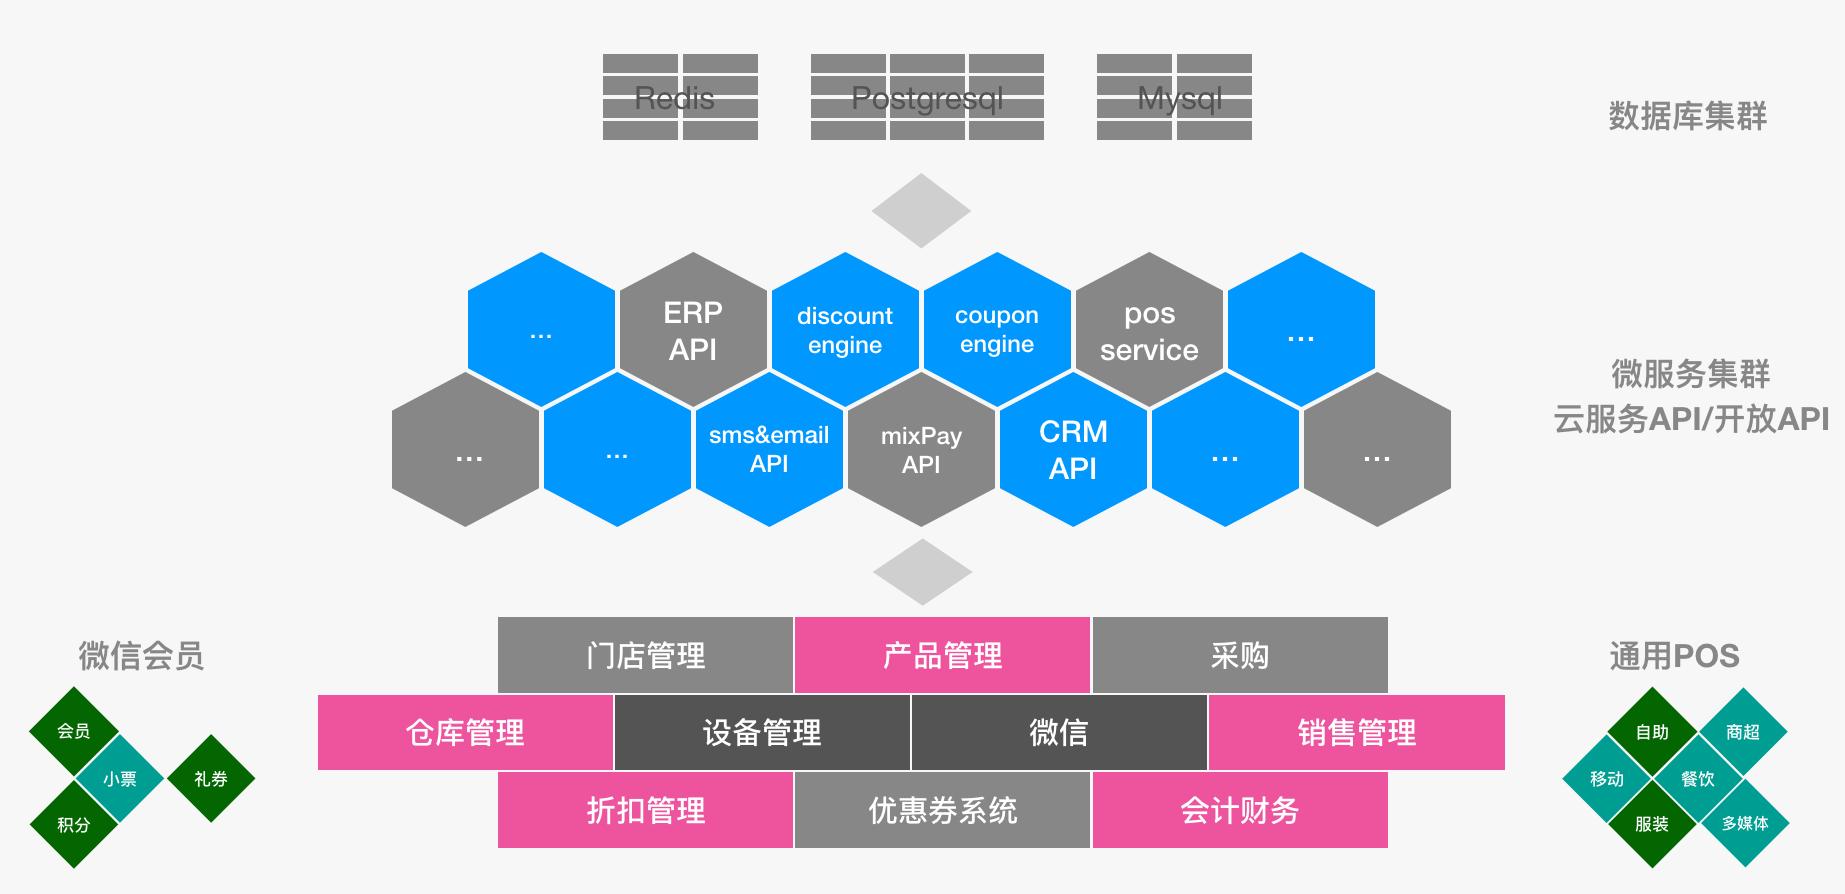 leadway technology,leadway cloud,super retail,leadway ERP,leadway